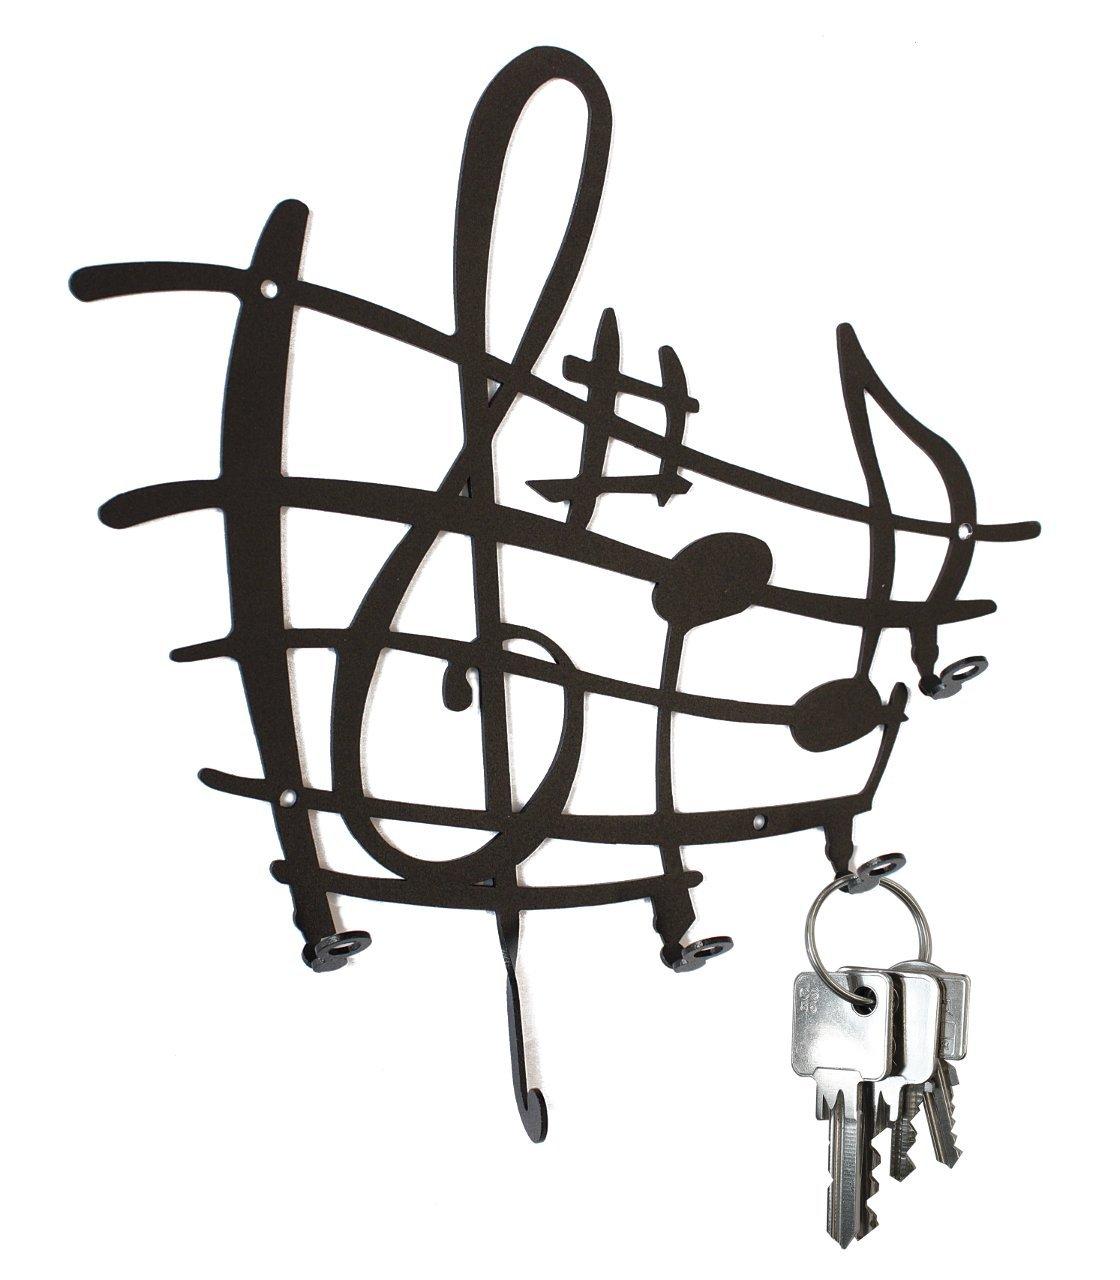 Key Hook Sheet of Music - Clef -Wall Key Holder, Metal, Black steelprint.de SB30-0005-01